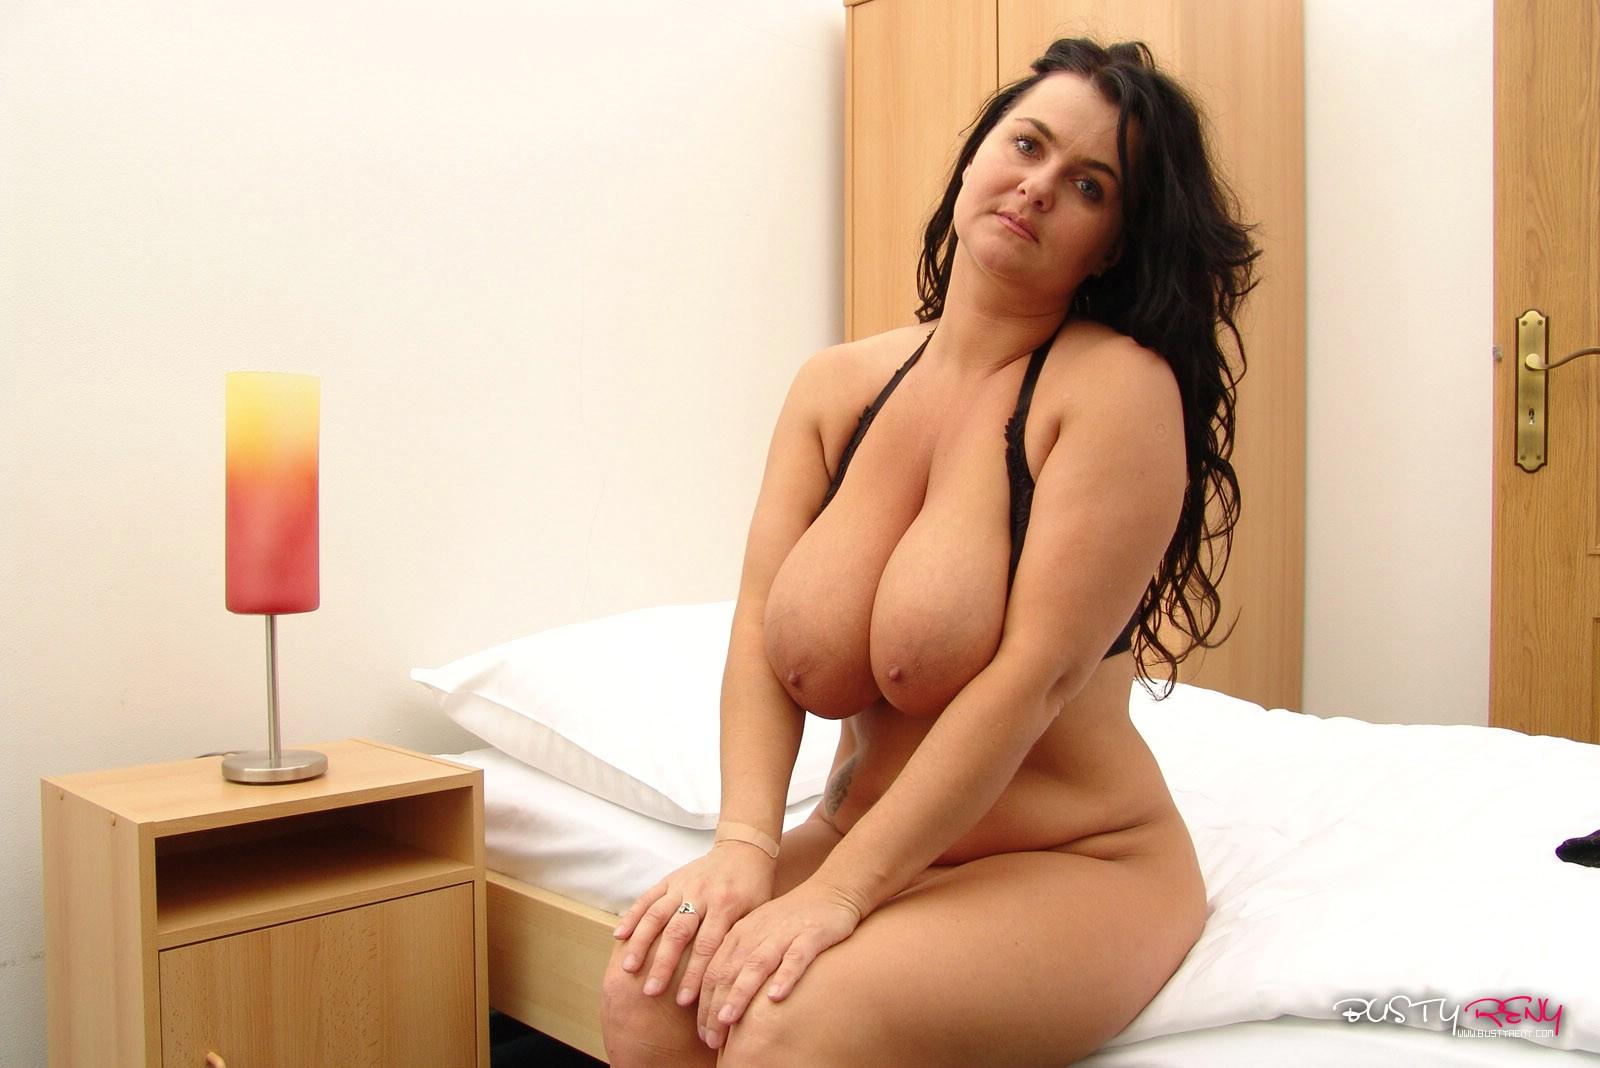 Xxx reny moms naked pics